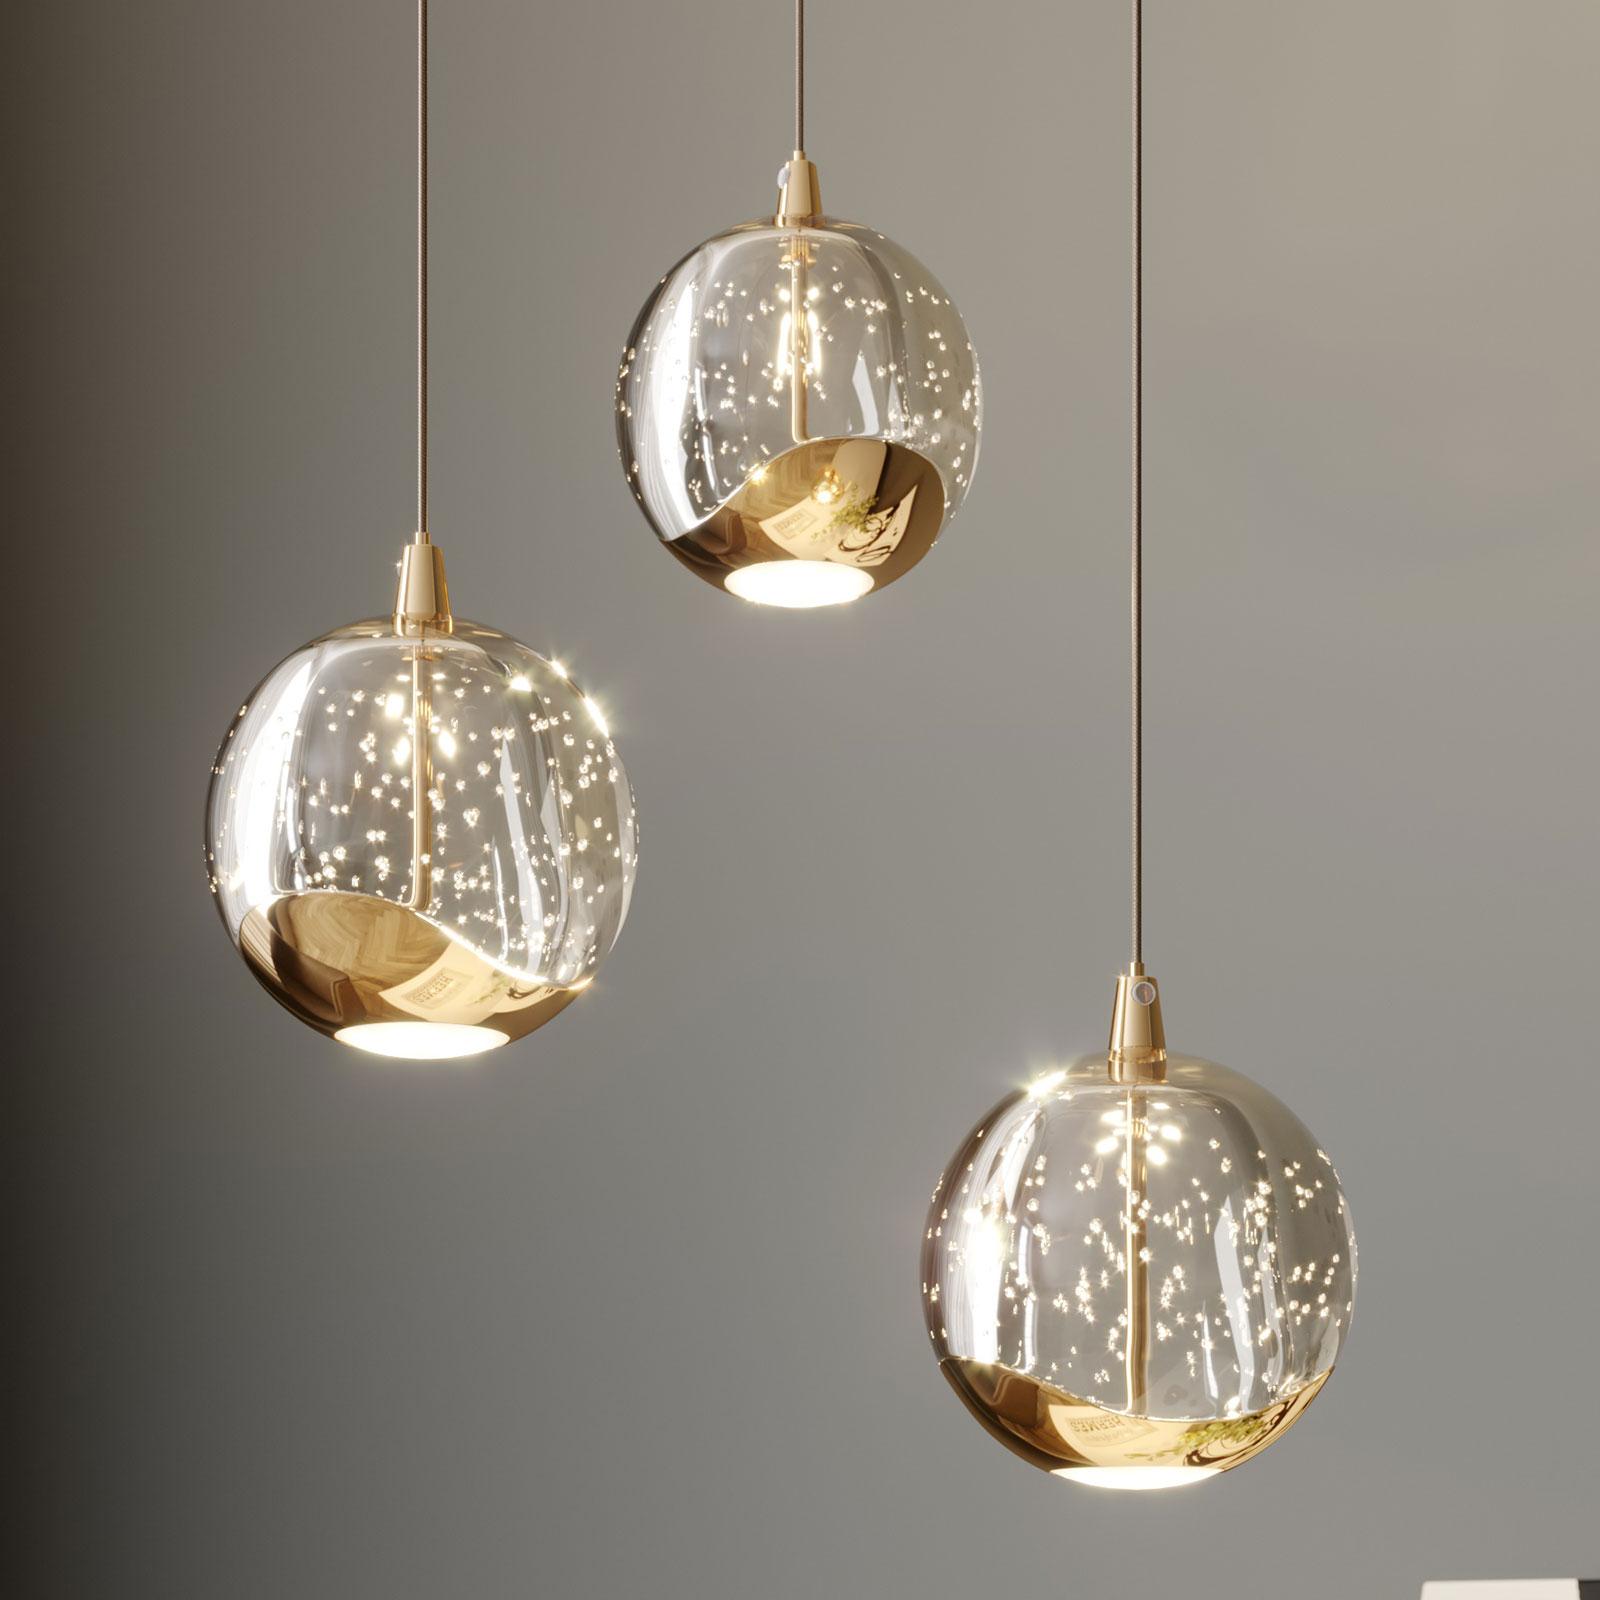 LED-pendellampe Hayley, 3 lyskilder, gull